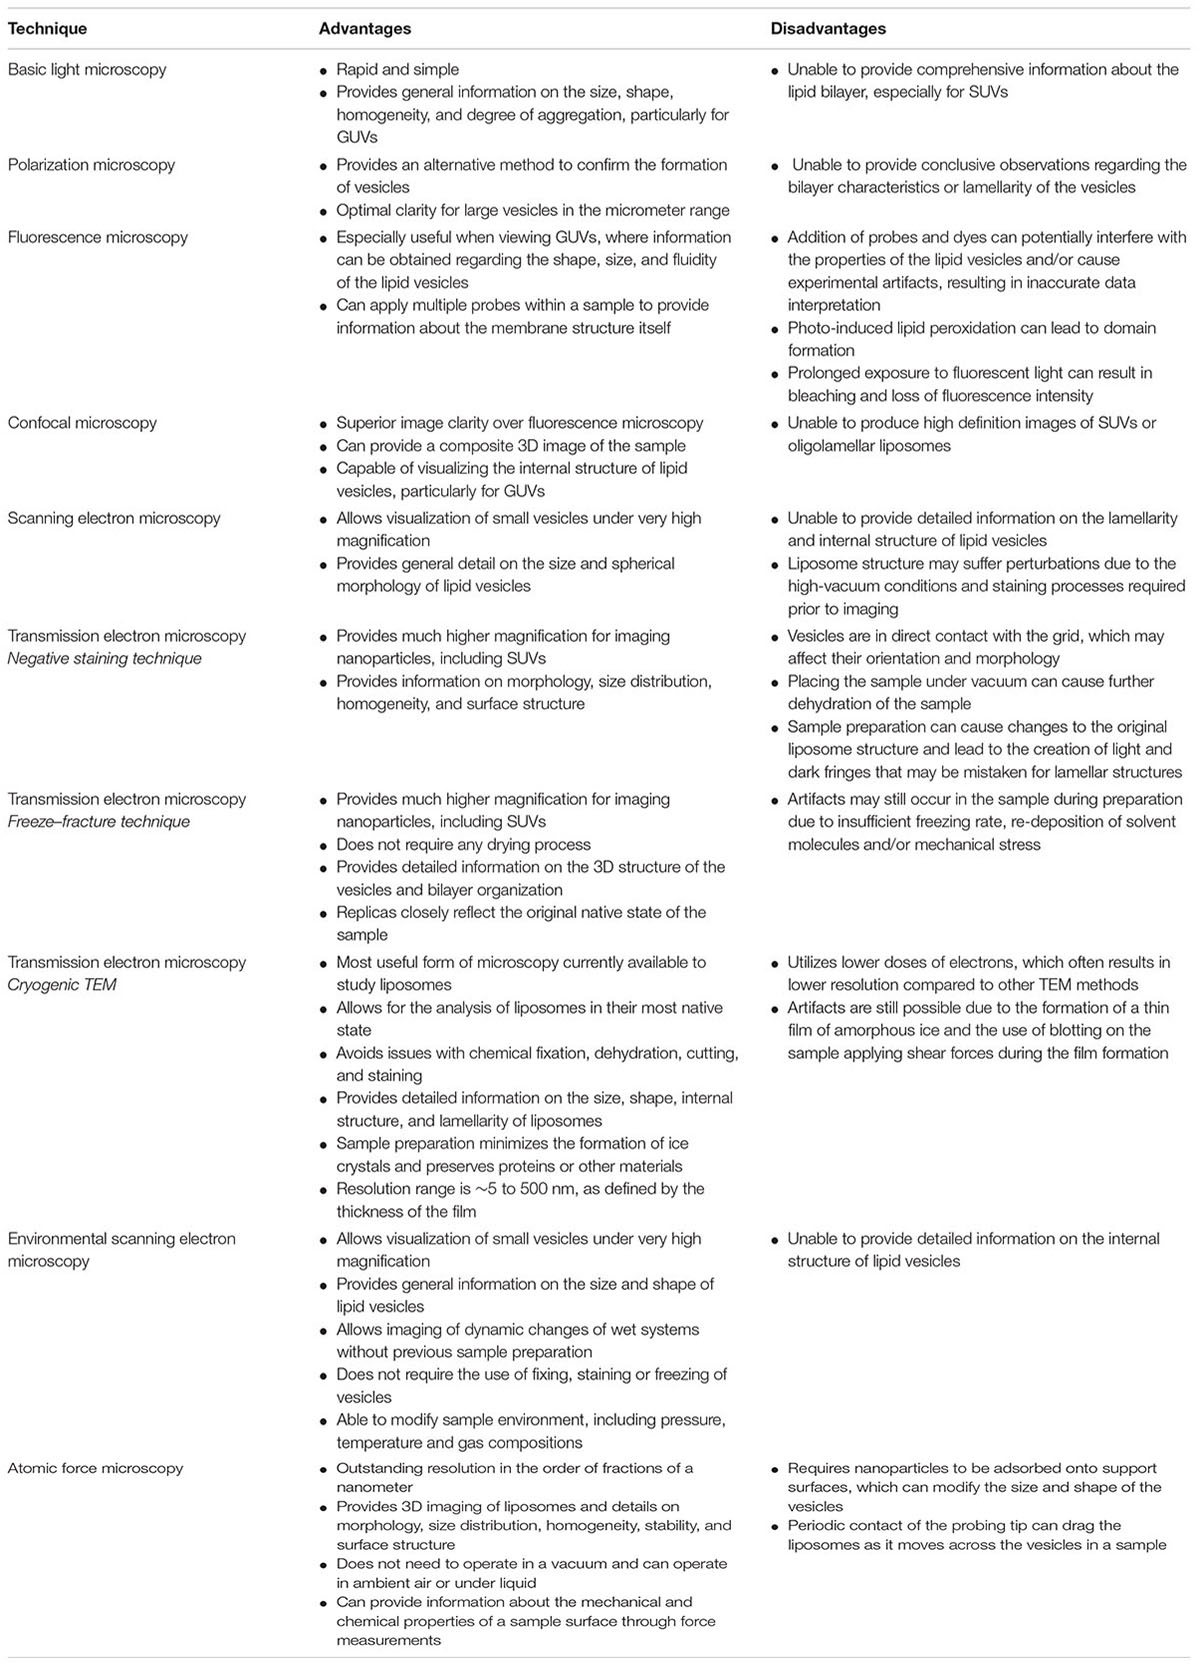 OTS-14 Thunderstorm: advantages and disadvantages 8